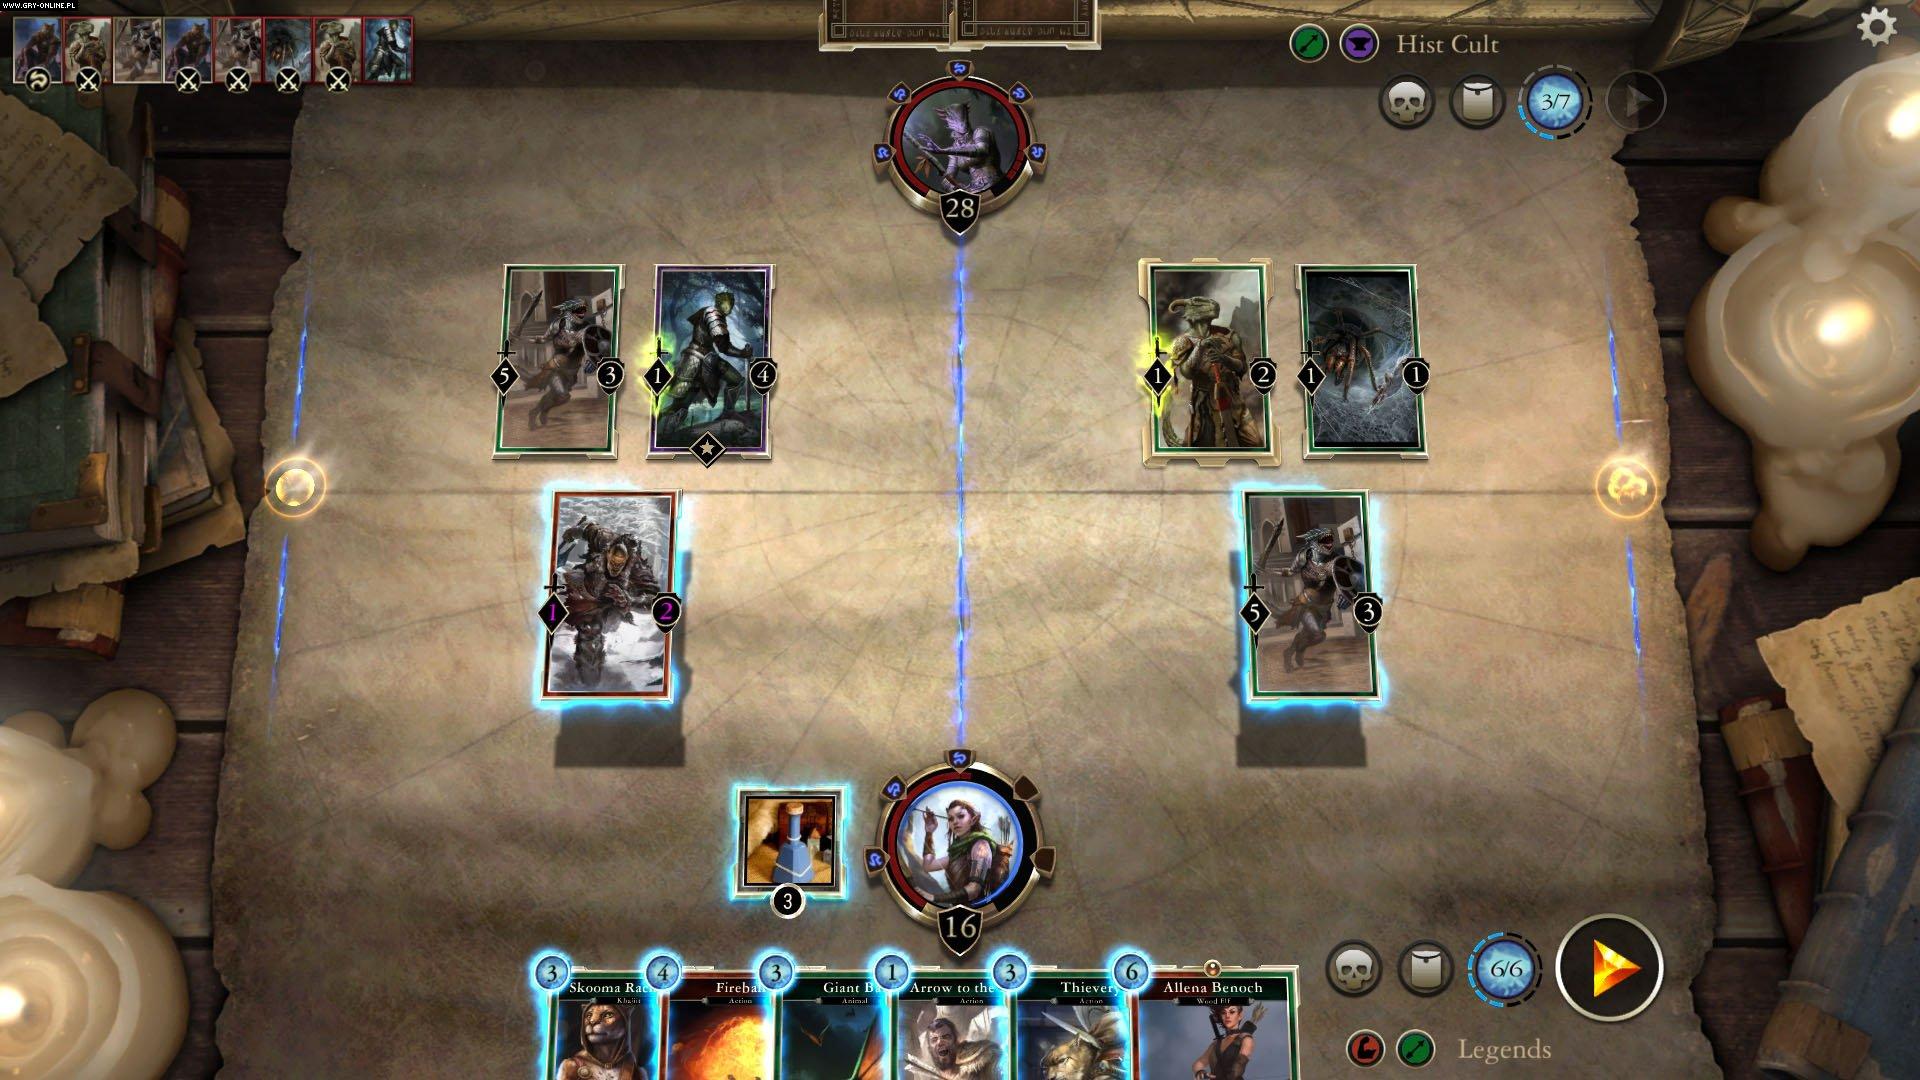 The Elder Scrolls: Legends PC, iOS Games Image 4/6, Bethesda Softworks